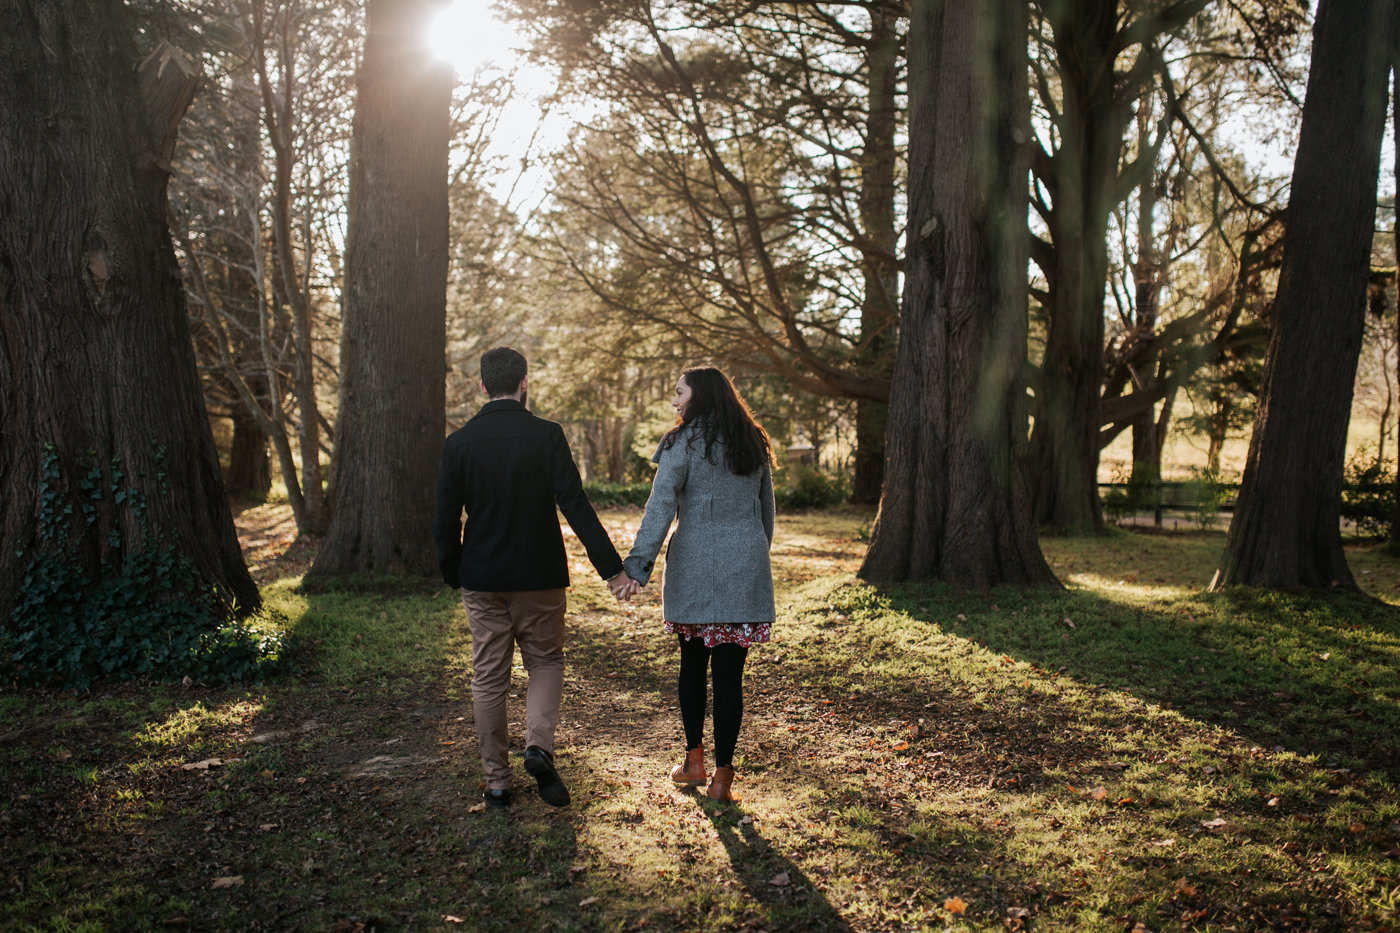 Kate & Kieran - Southern Highlands Engagement - Samantha Heather Photography-6.jpg